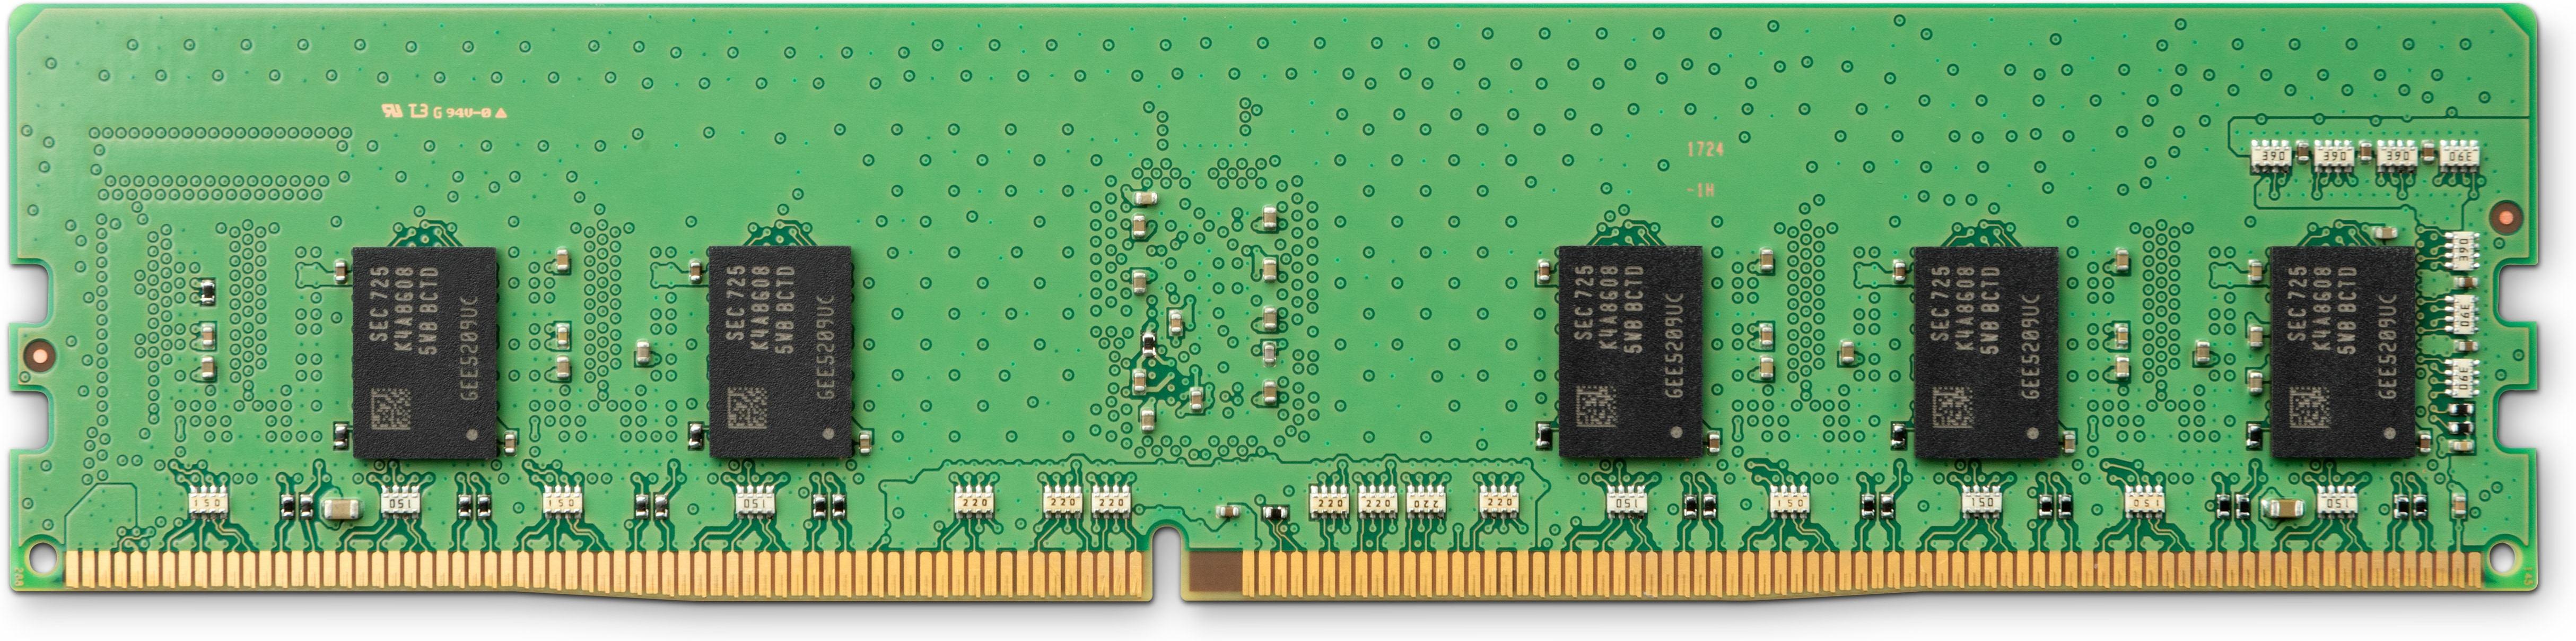 2044314-HP-8GB-DDR4-2666-DIMM-memoria-2666-MHz-HP-RAM-Module-8-GB-1-x-8-GB